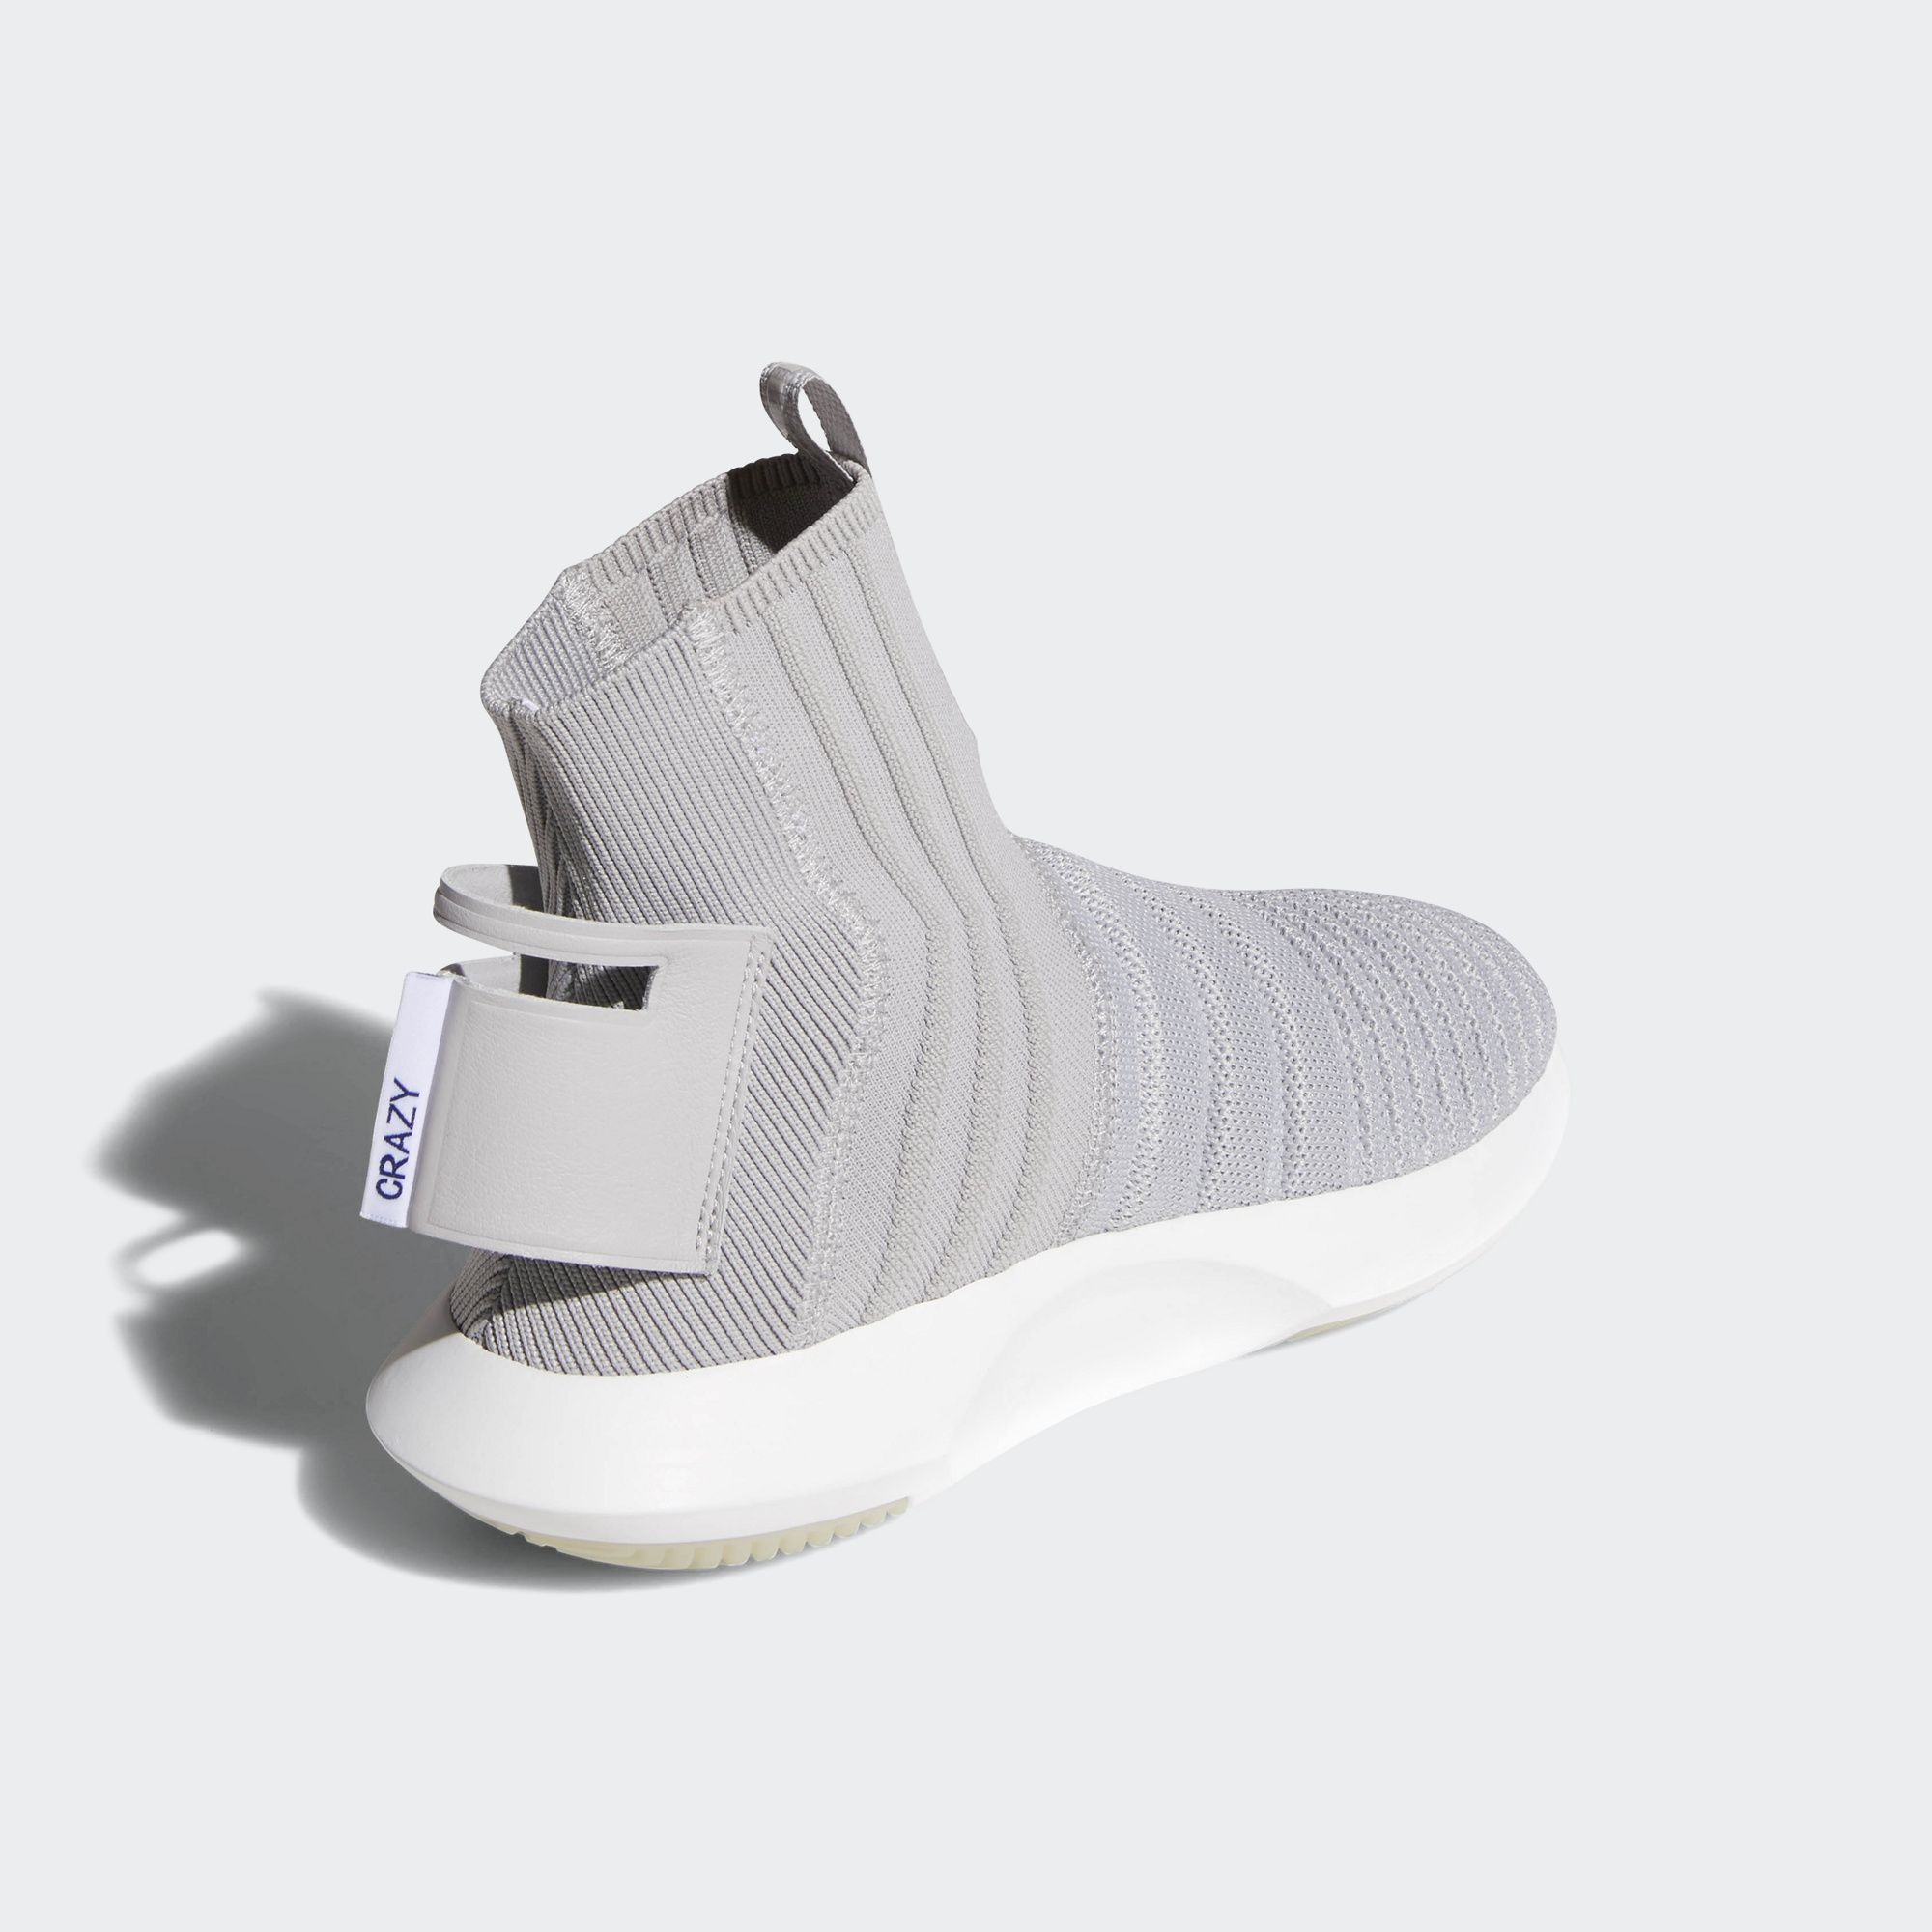 adidas Crazy 1 ADV PK sock 10